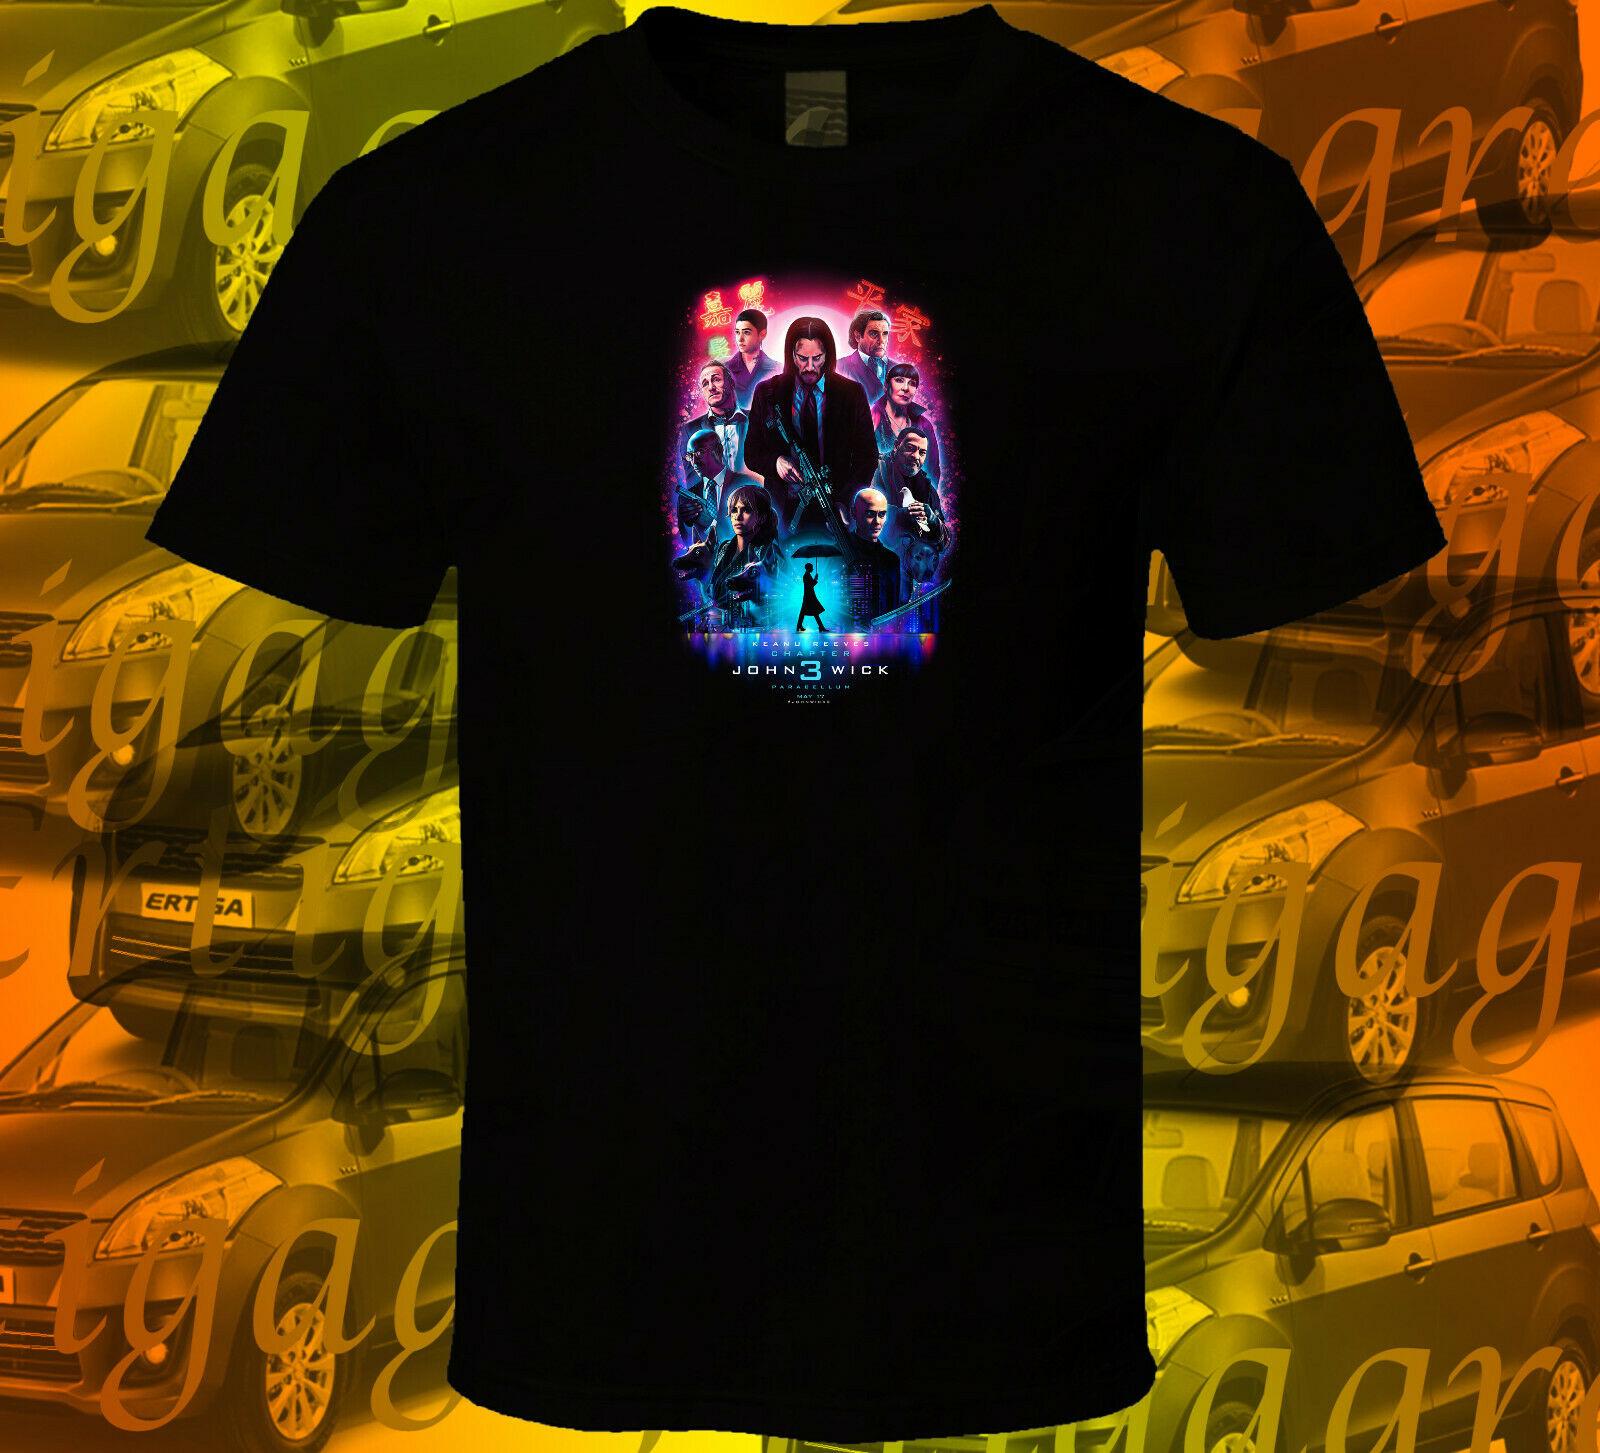 John Wick Chapter 3 V1 S 3XL Short Sleeve Black T Shirt 2018 New Pure Cotton Short Sleeves Hip Hop Fashion Mens T Shirt in T Shirts from Men 39 s Clothing